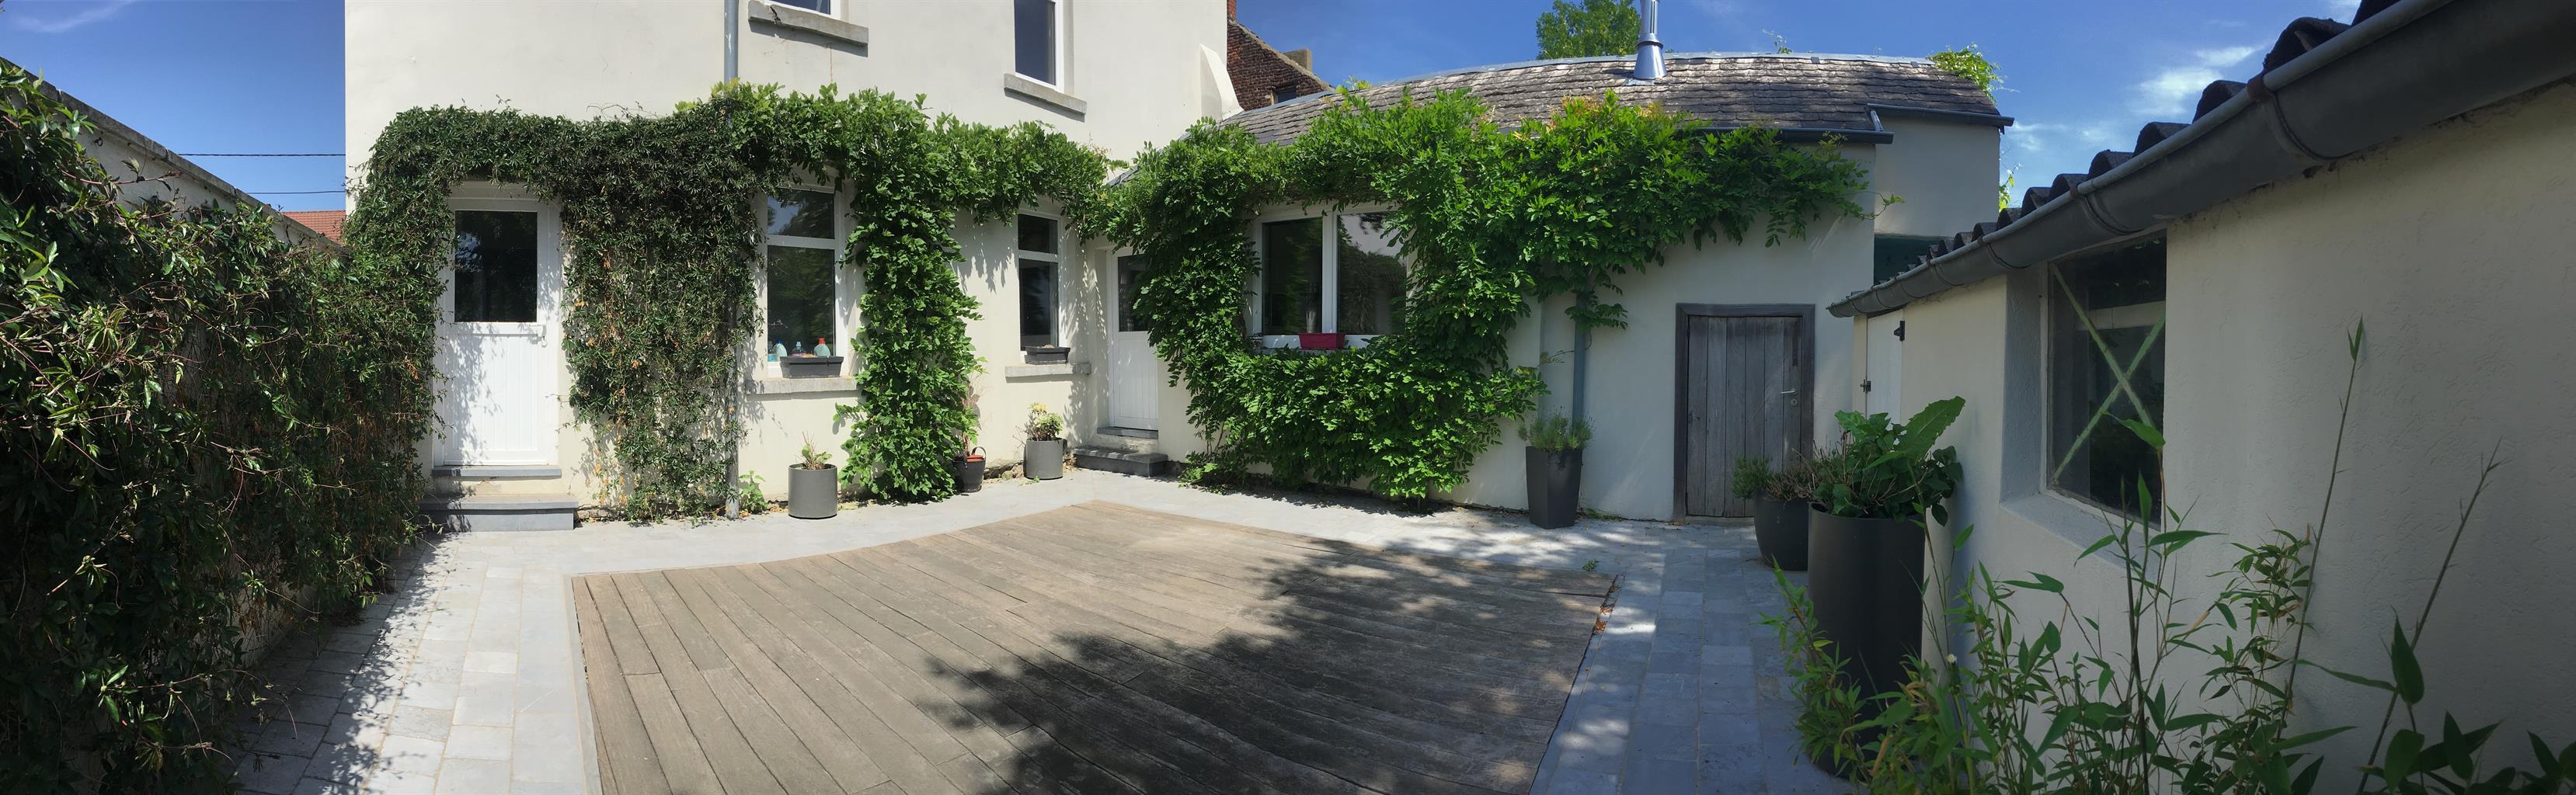 House - Villersla-Ville Tilly - #3578285-10